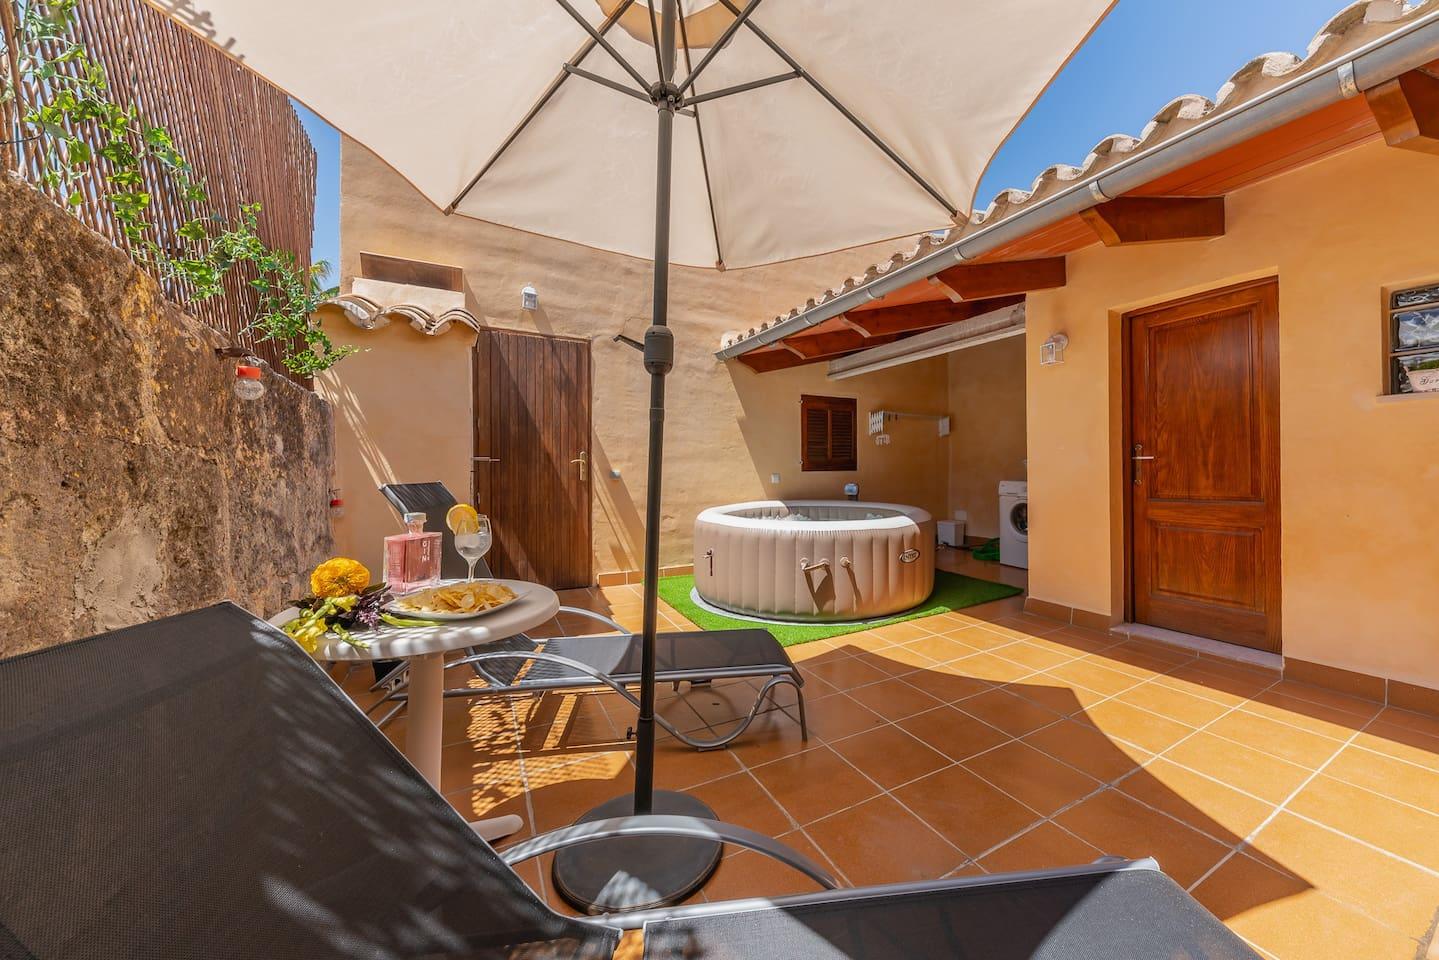 S'Arraval: Nice house with terrace & jacuzzi